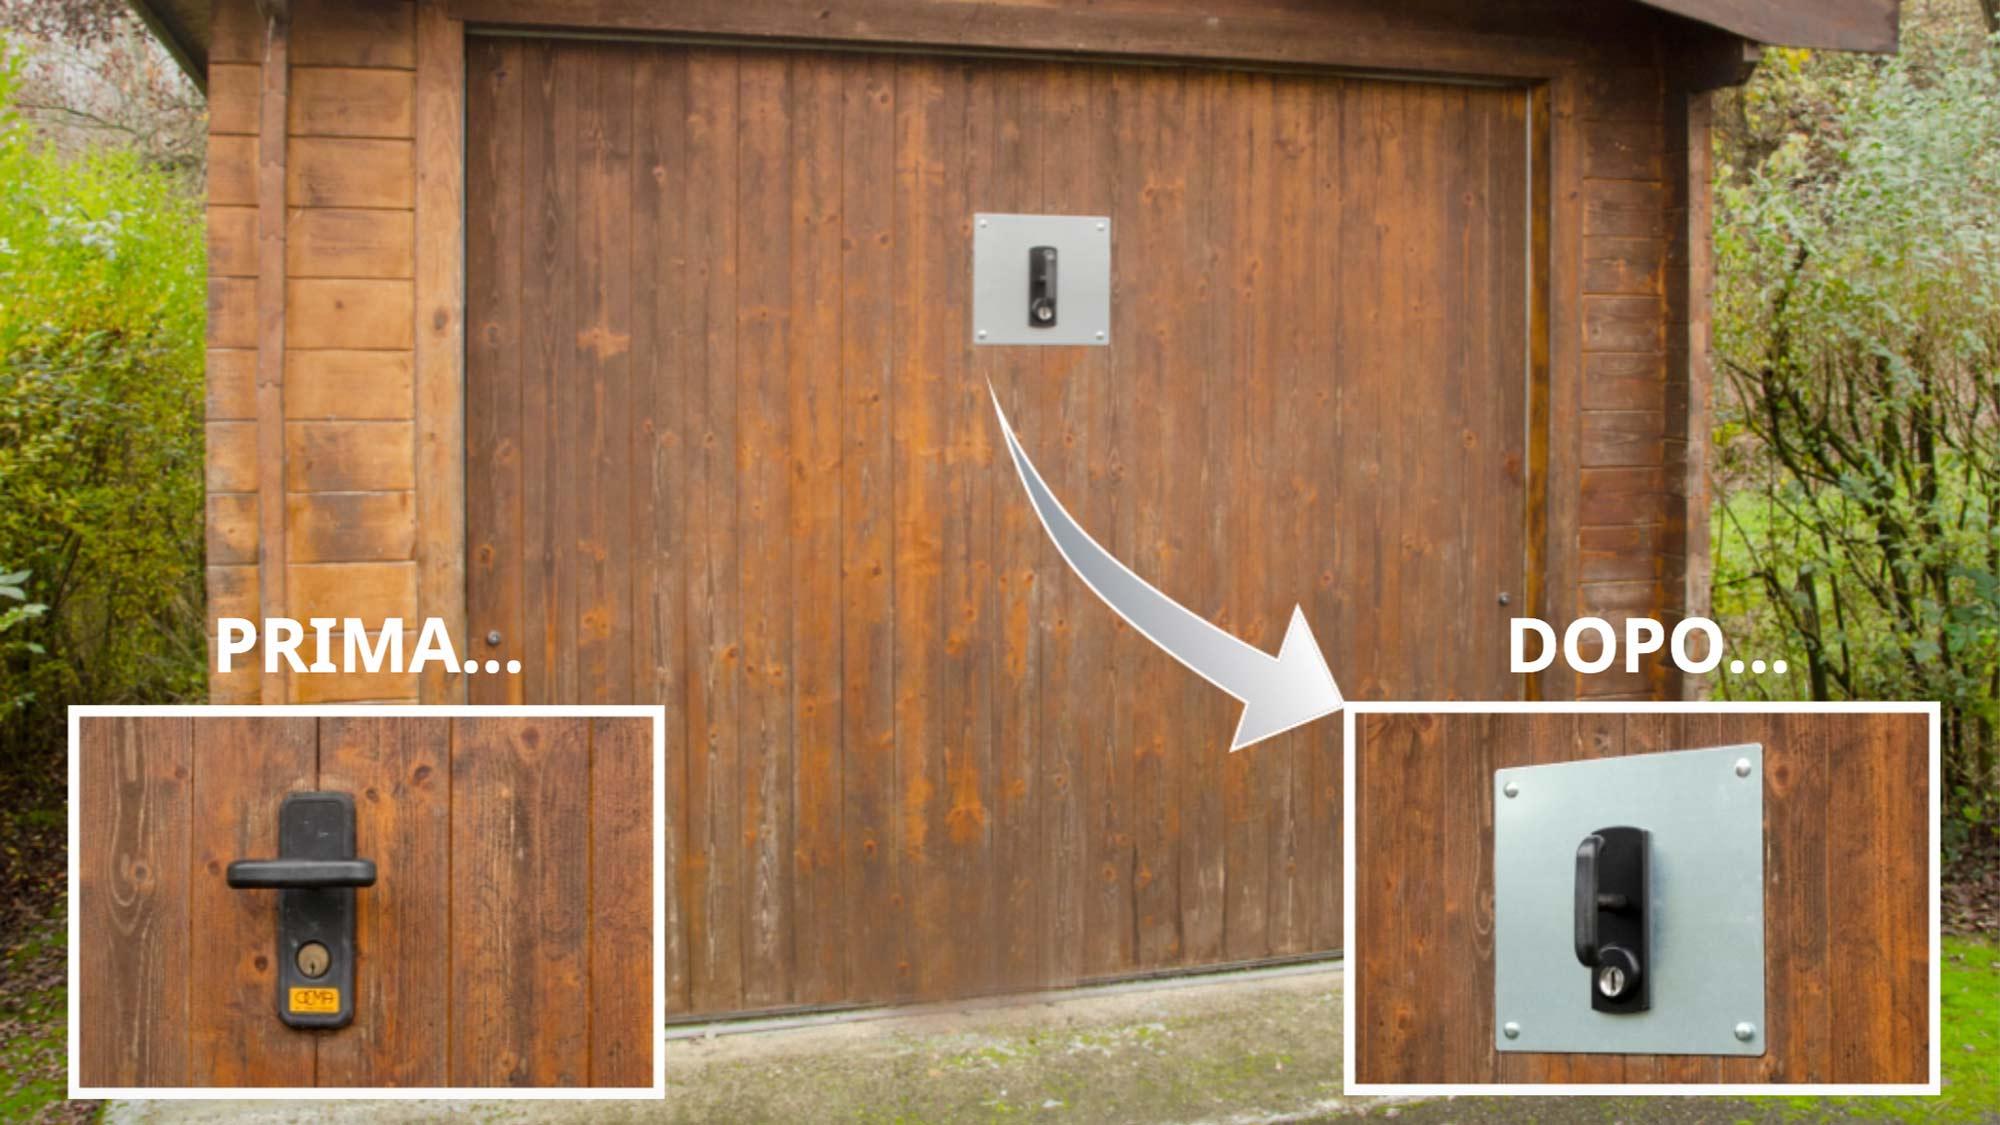 Piastra di rinforzo per garage sicuro | Sacar